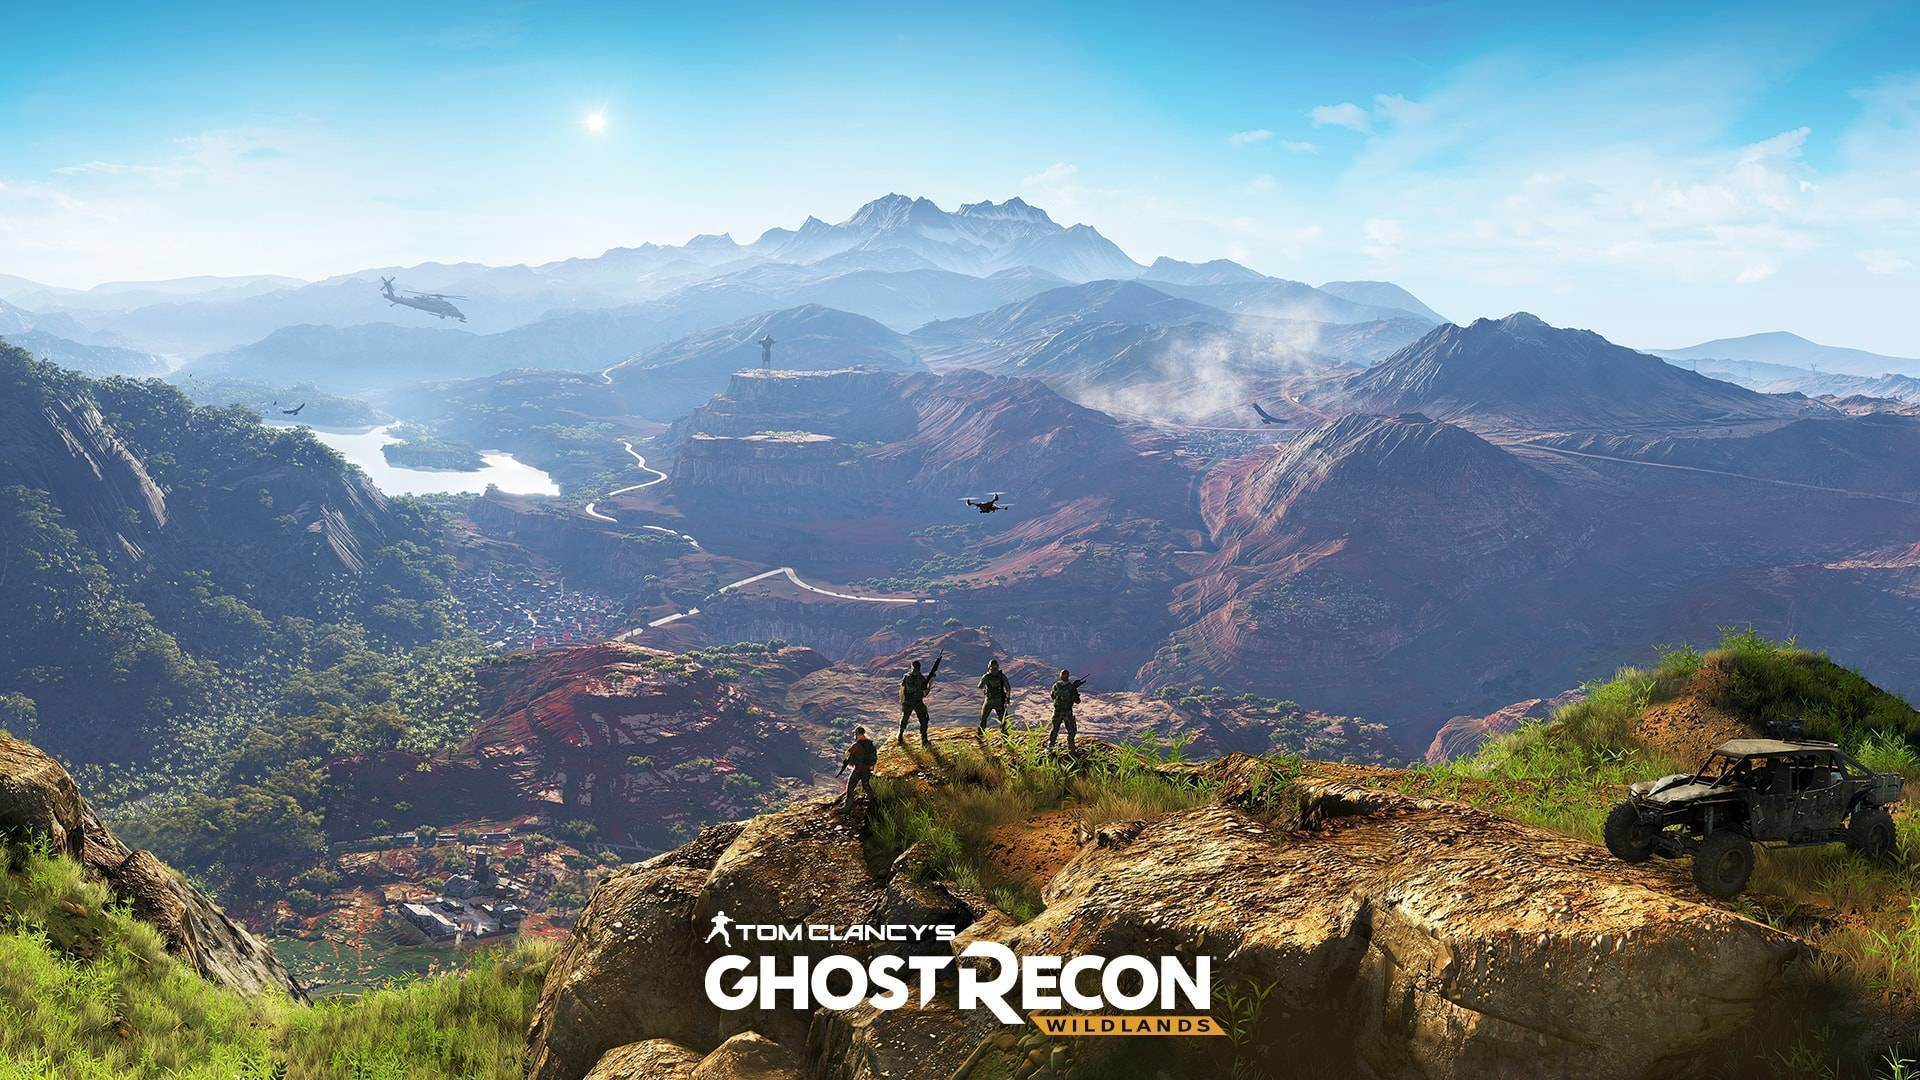 Ghost Recon Wildlands gratuit ce week-end !